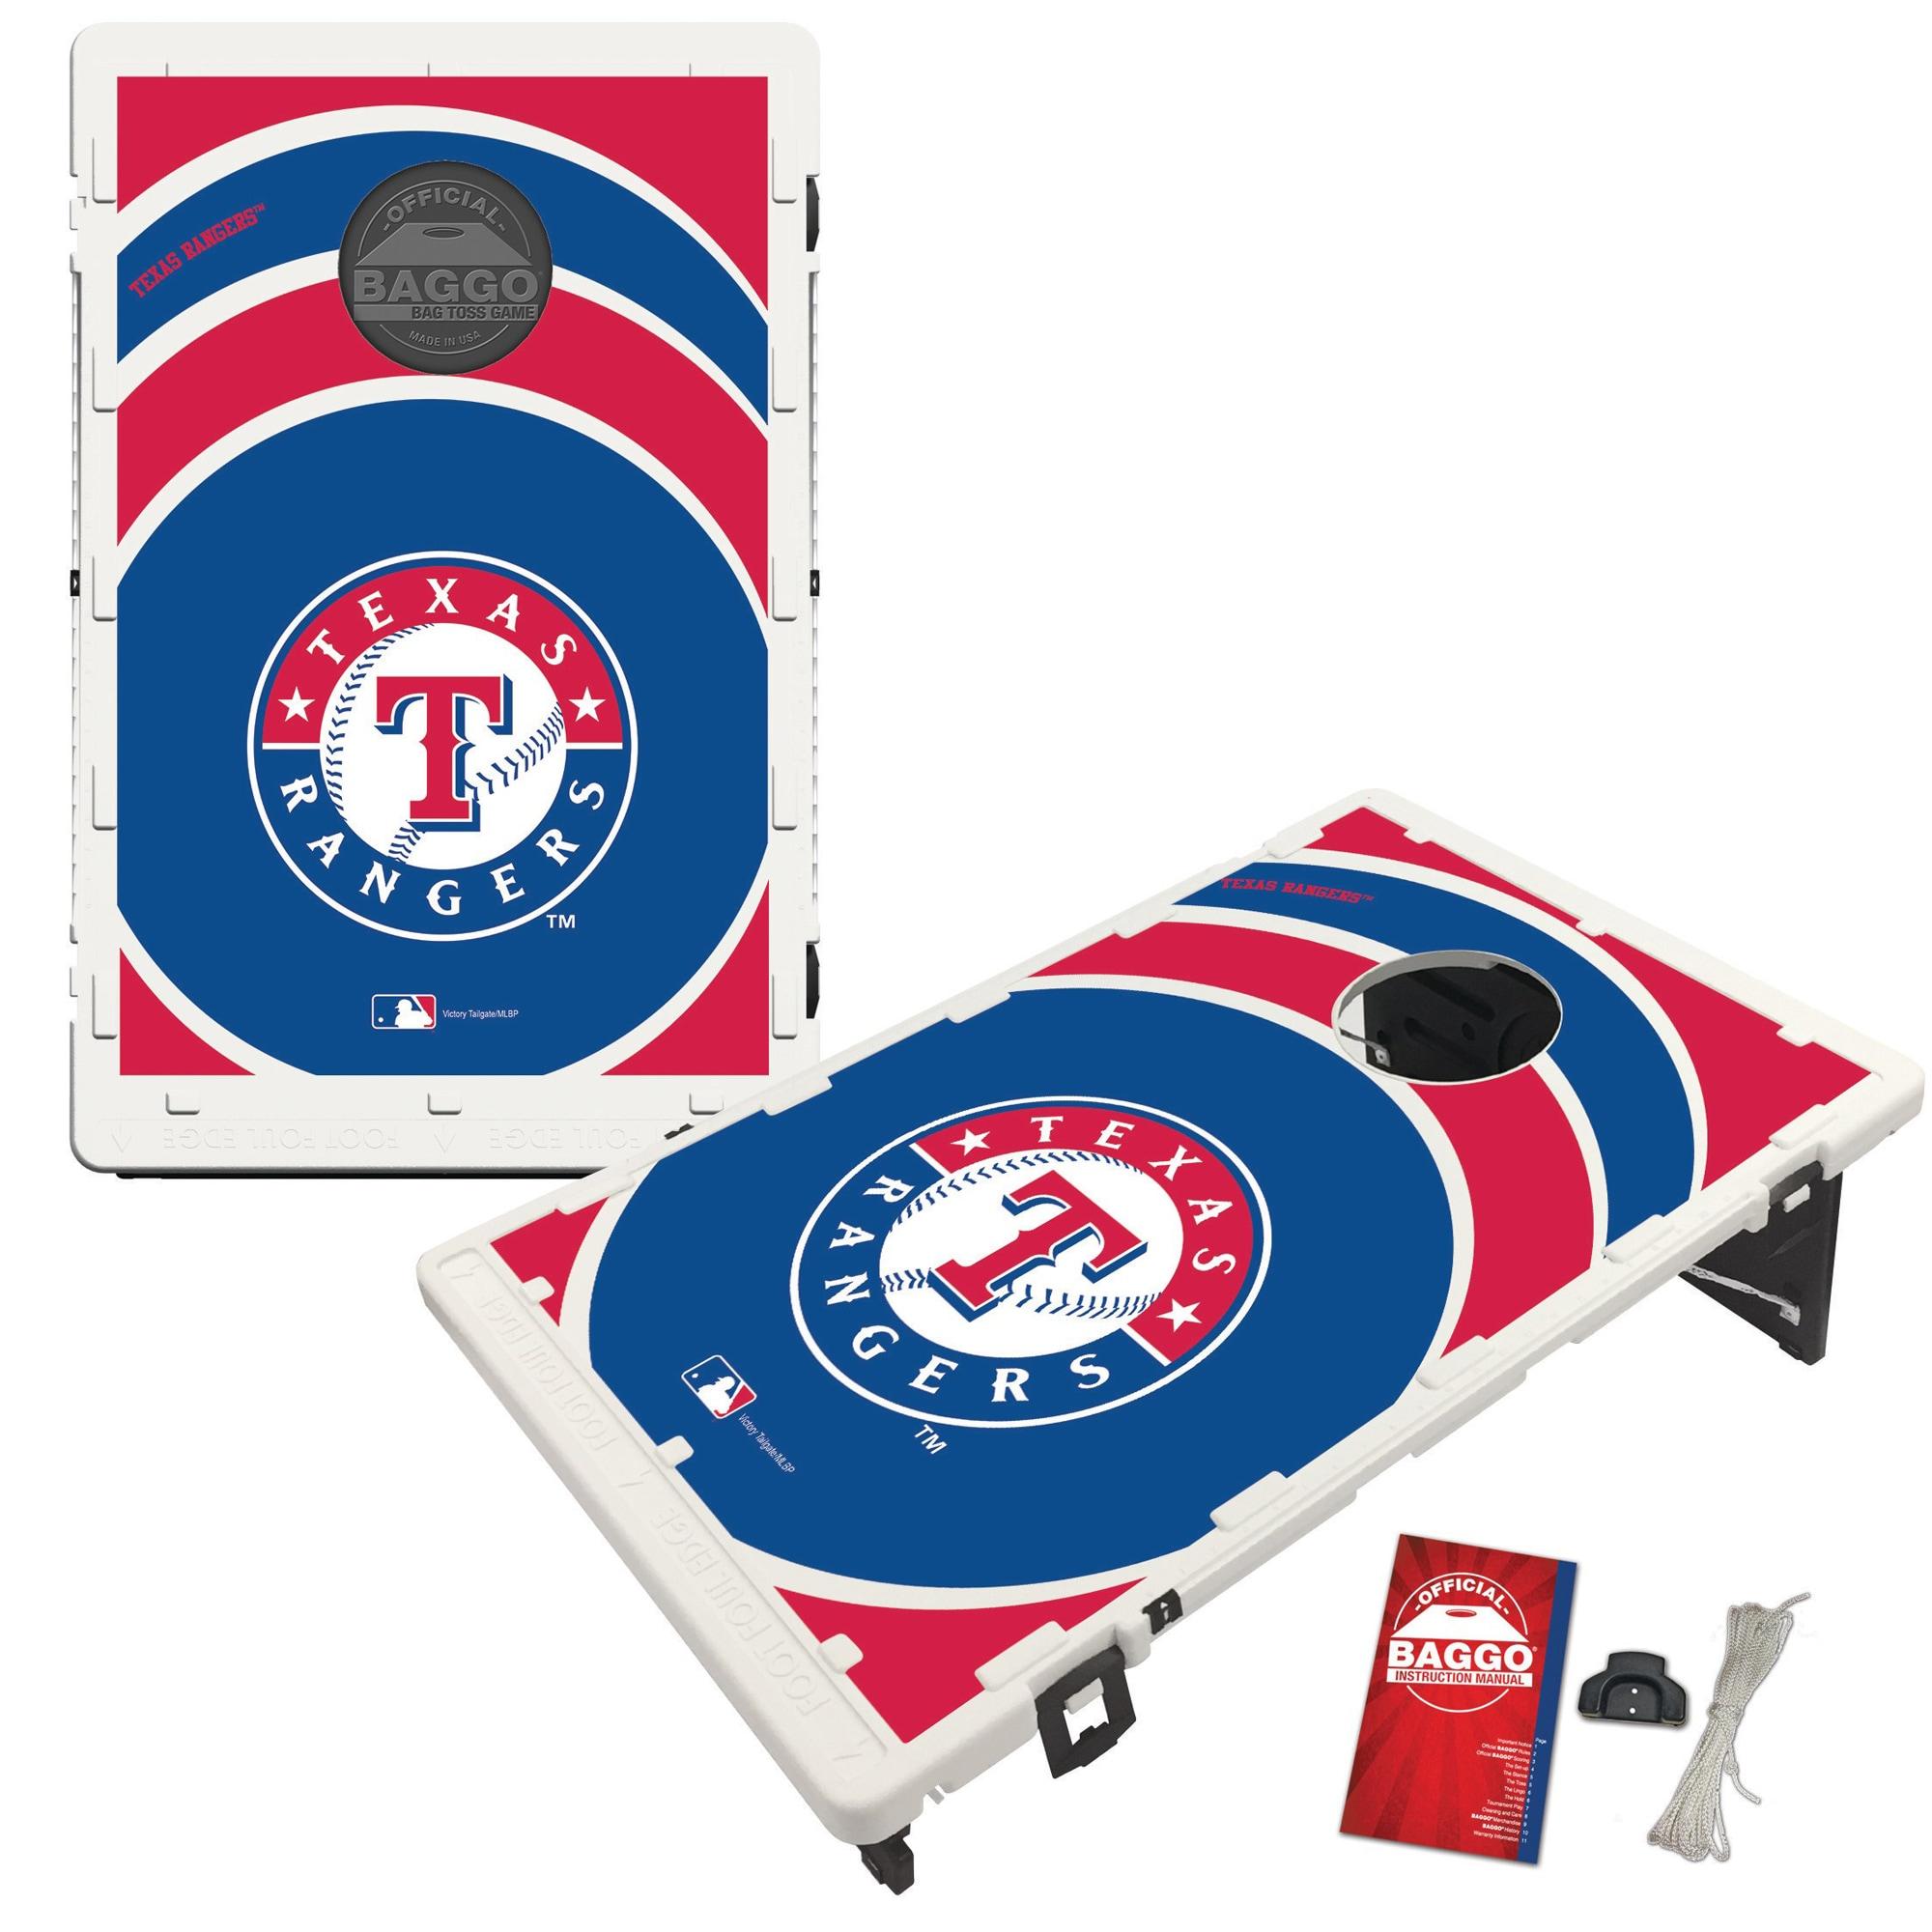 Texas Rangers 2' x 3' BAGGO Vortex Cornhole Board Tailgate Toss Set